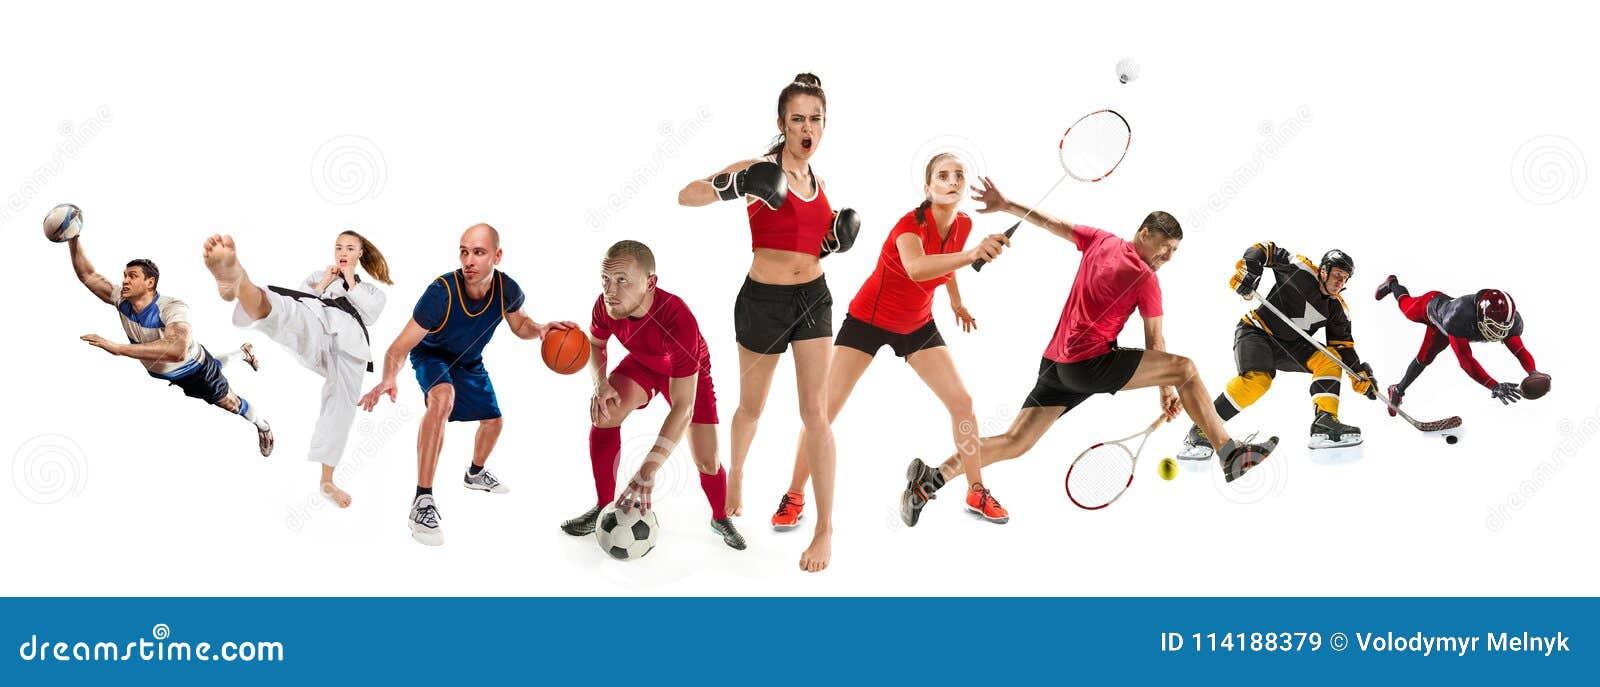 Sportcollage om kickboxing, fotboll, amerikansk fotboll, basket, ishockey, badminton, Taekwondo, tennis, rugby